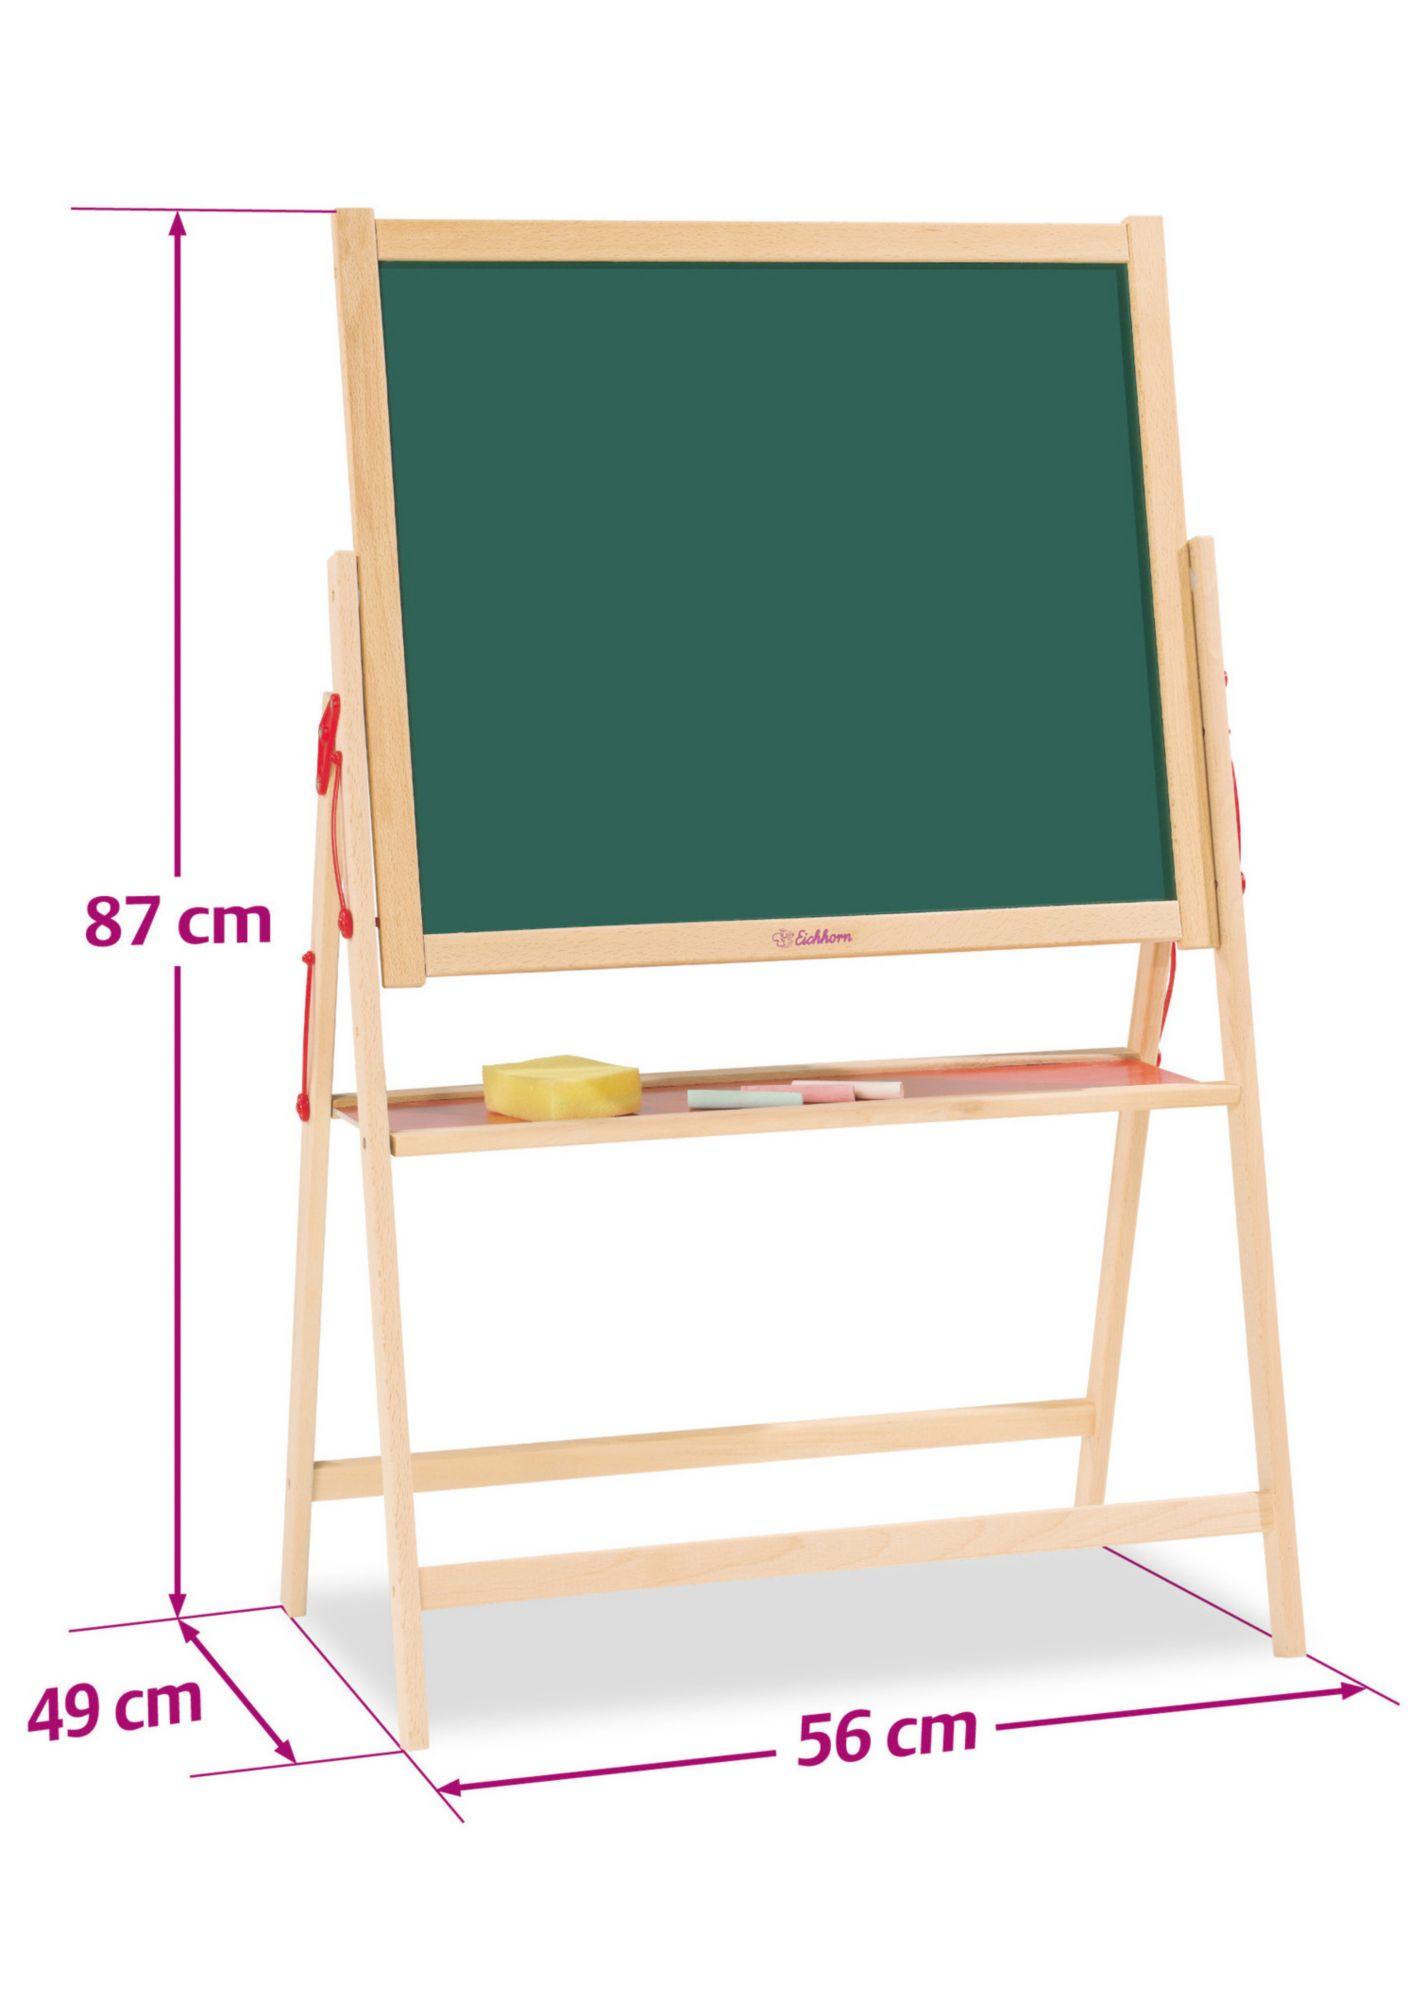 magnet tafel eichhorn schwab versand kreidetafel. Black Bedroom Furniture Sets. Home Design Ideas